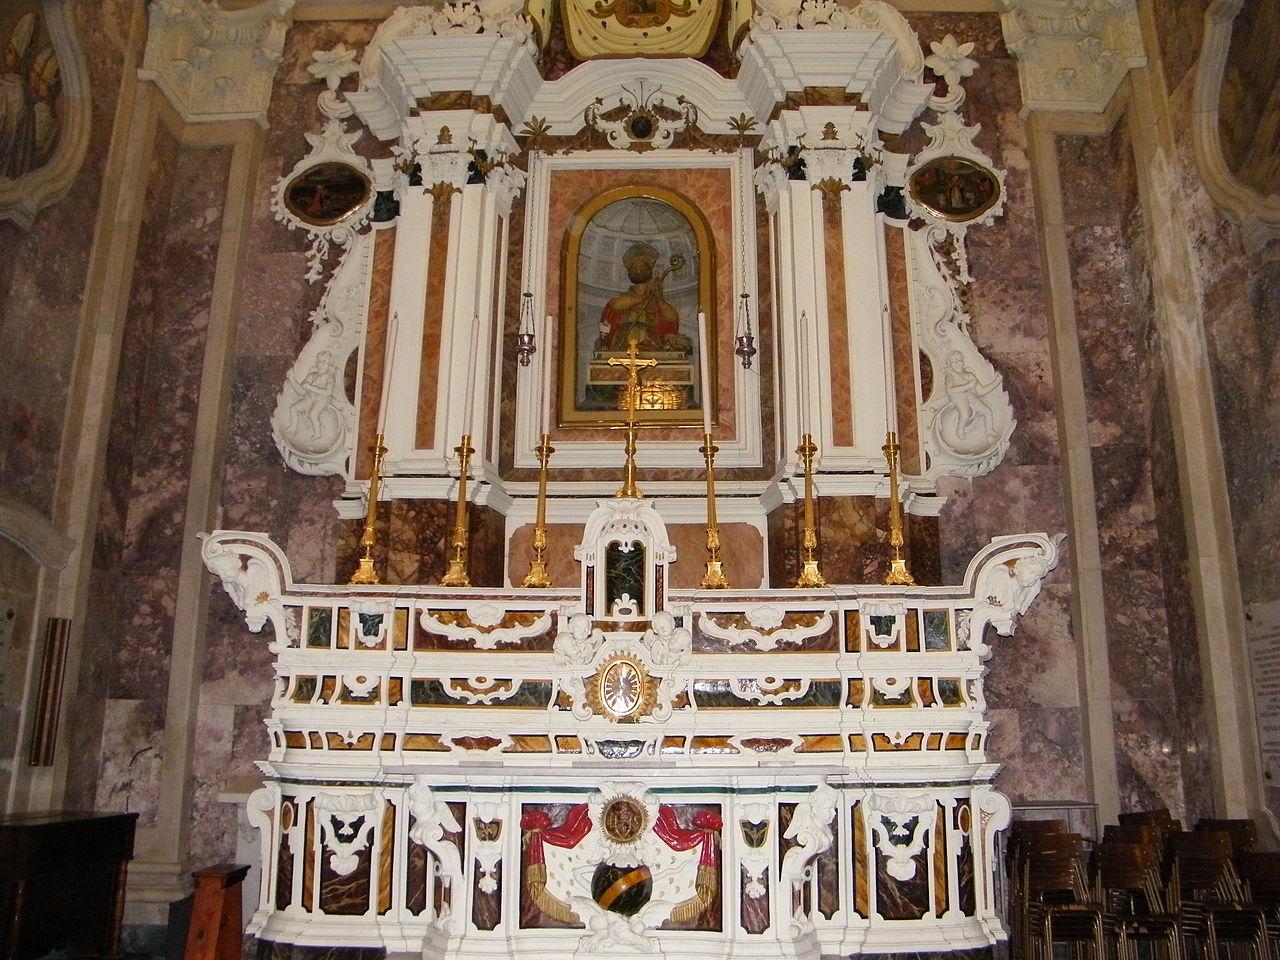 San Vitaliano, Catanzaro / Wikimedia Commons - GJo, CC BY-SA 2.5